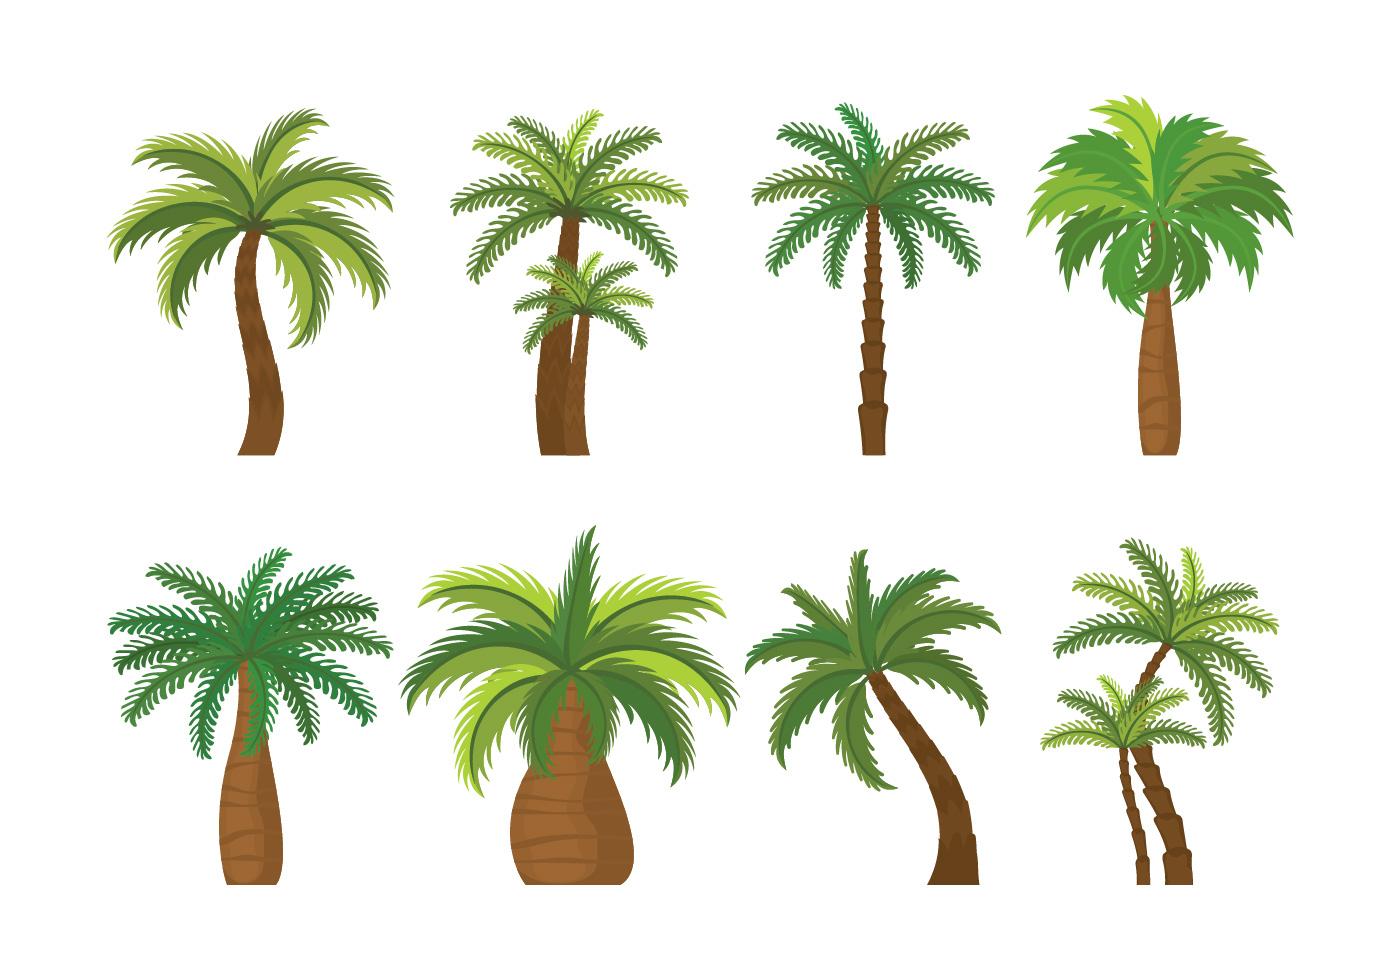 Palmier icons set download free vector art stock graphics images - Palmier clipart ...